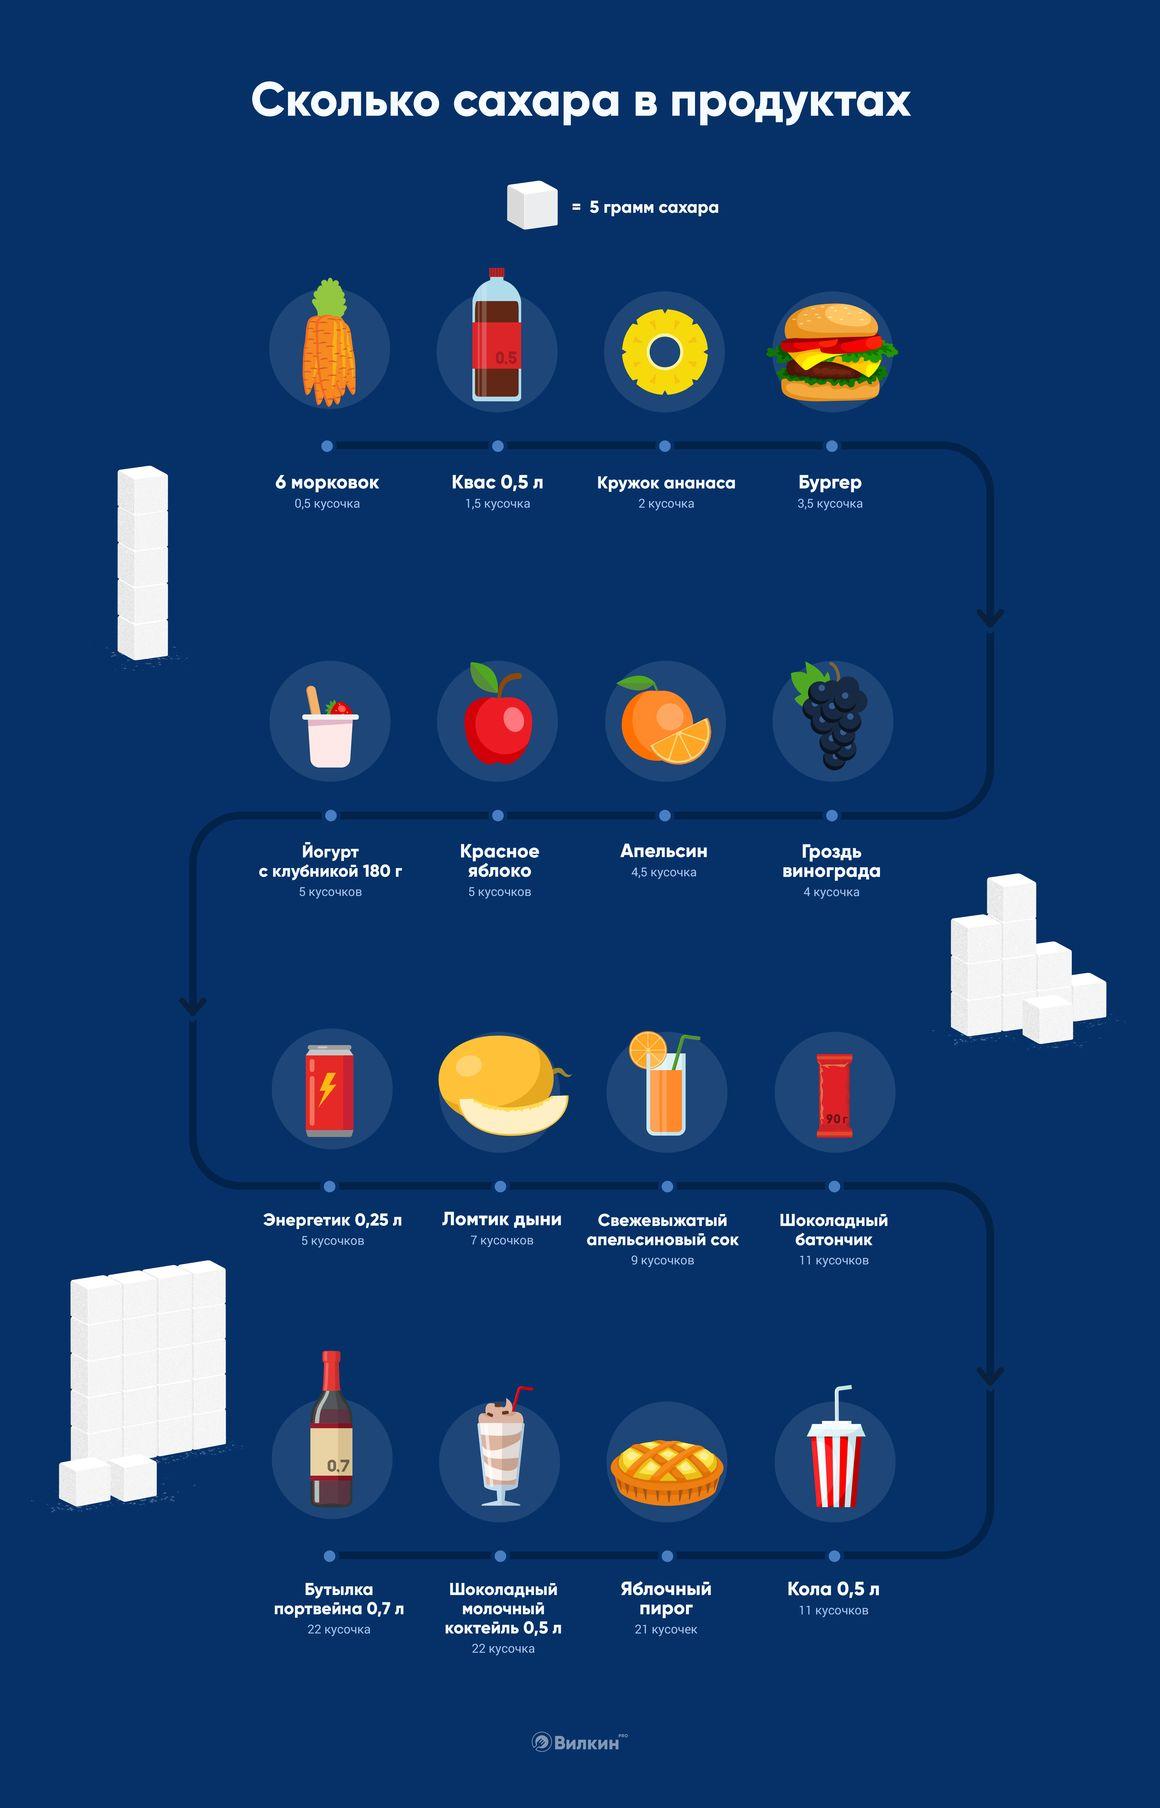 Сколько сахара в продуктах